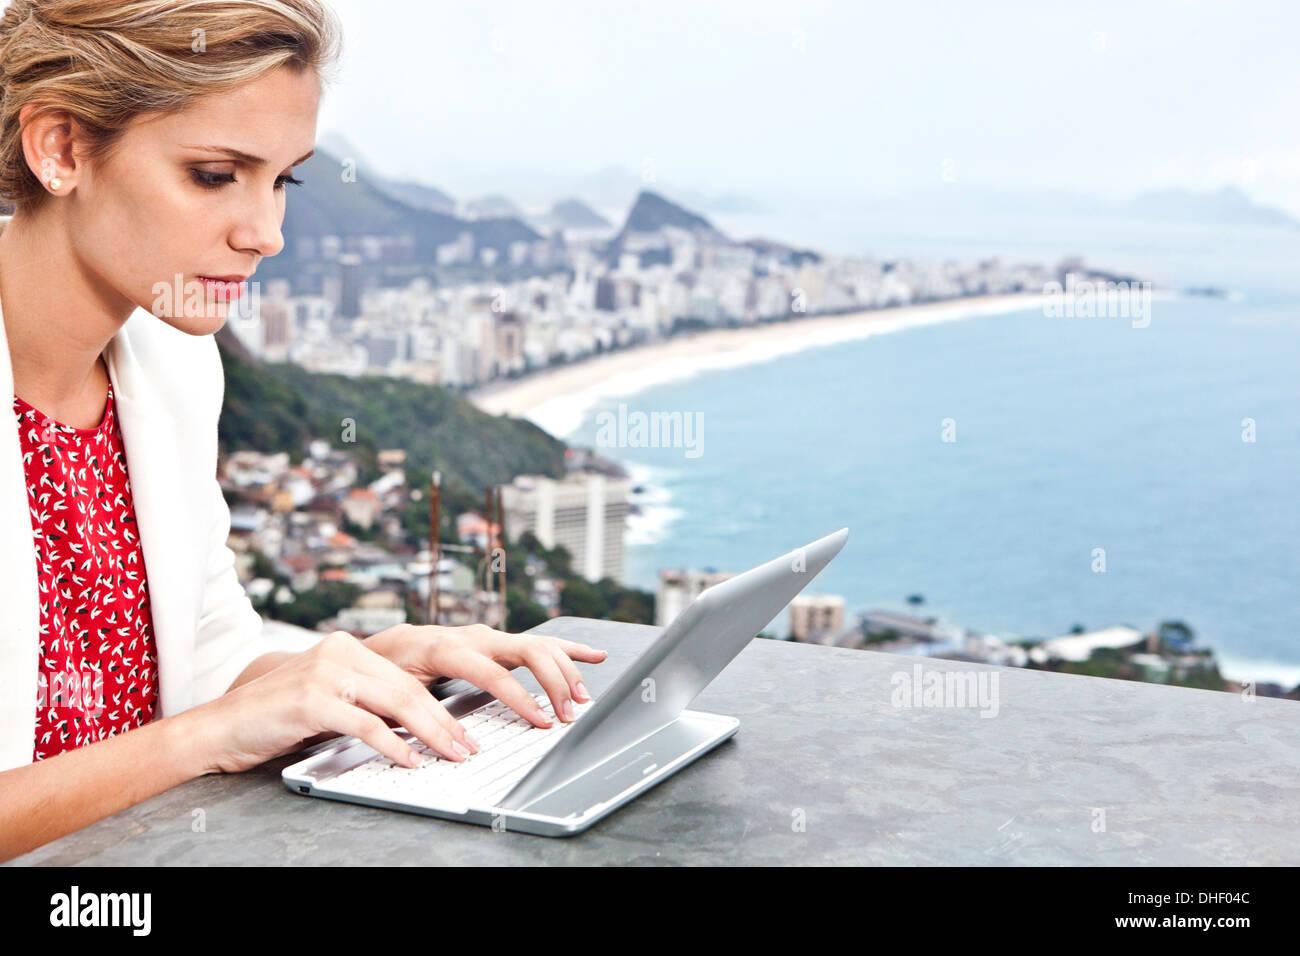 Giovane donna utilizzando laptop, Casa Alto Vidigal, Rio de Janeiro, Brasile Immagini Stock